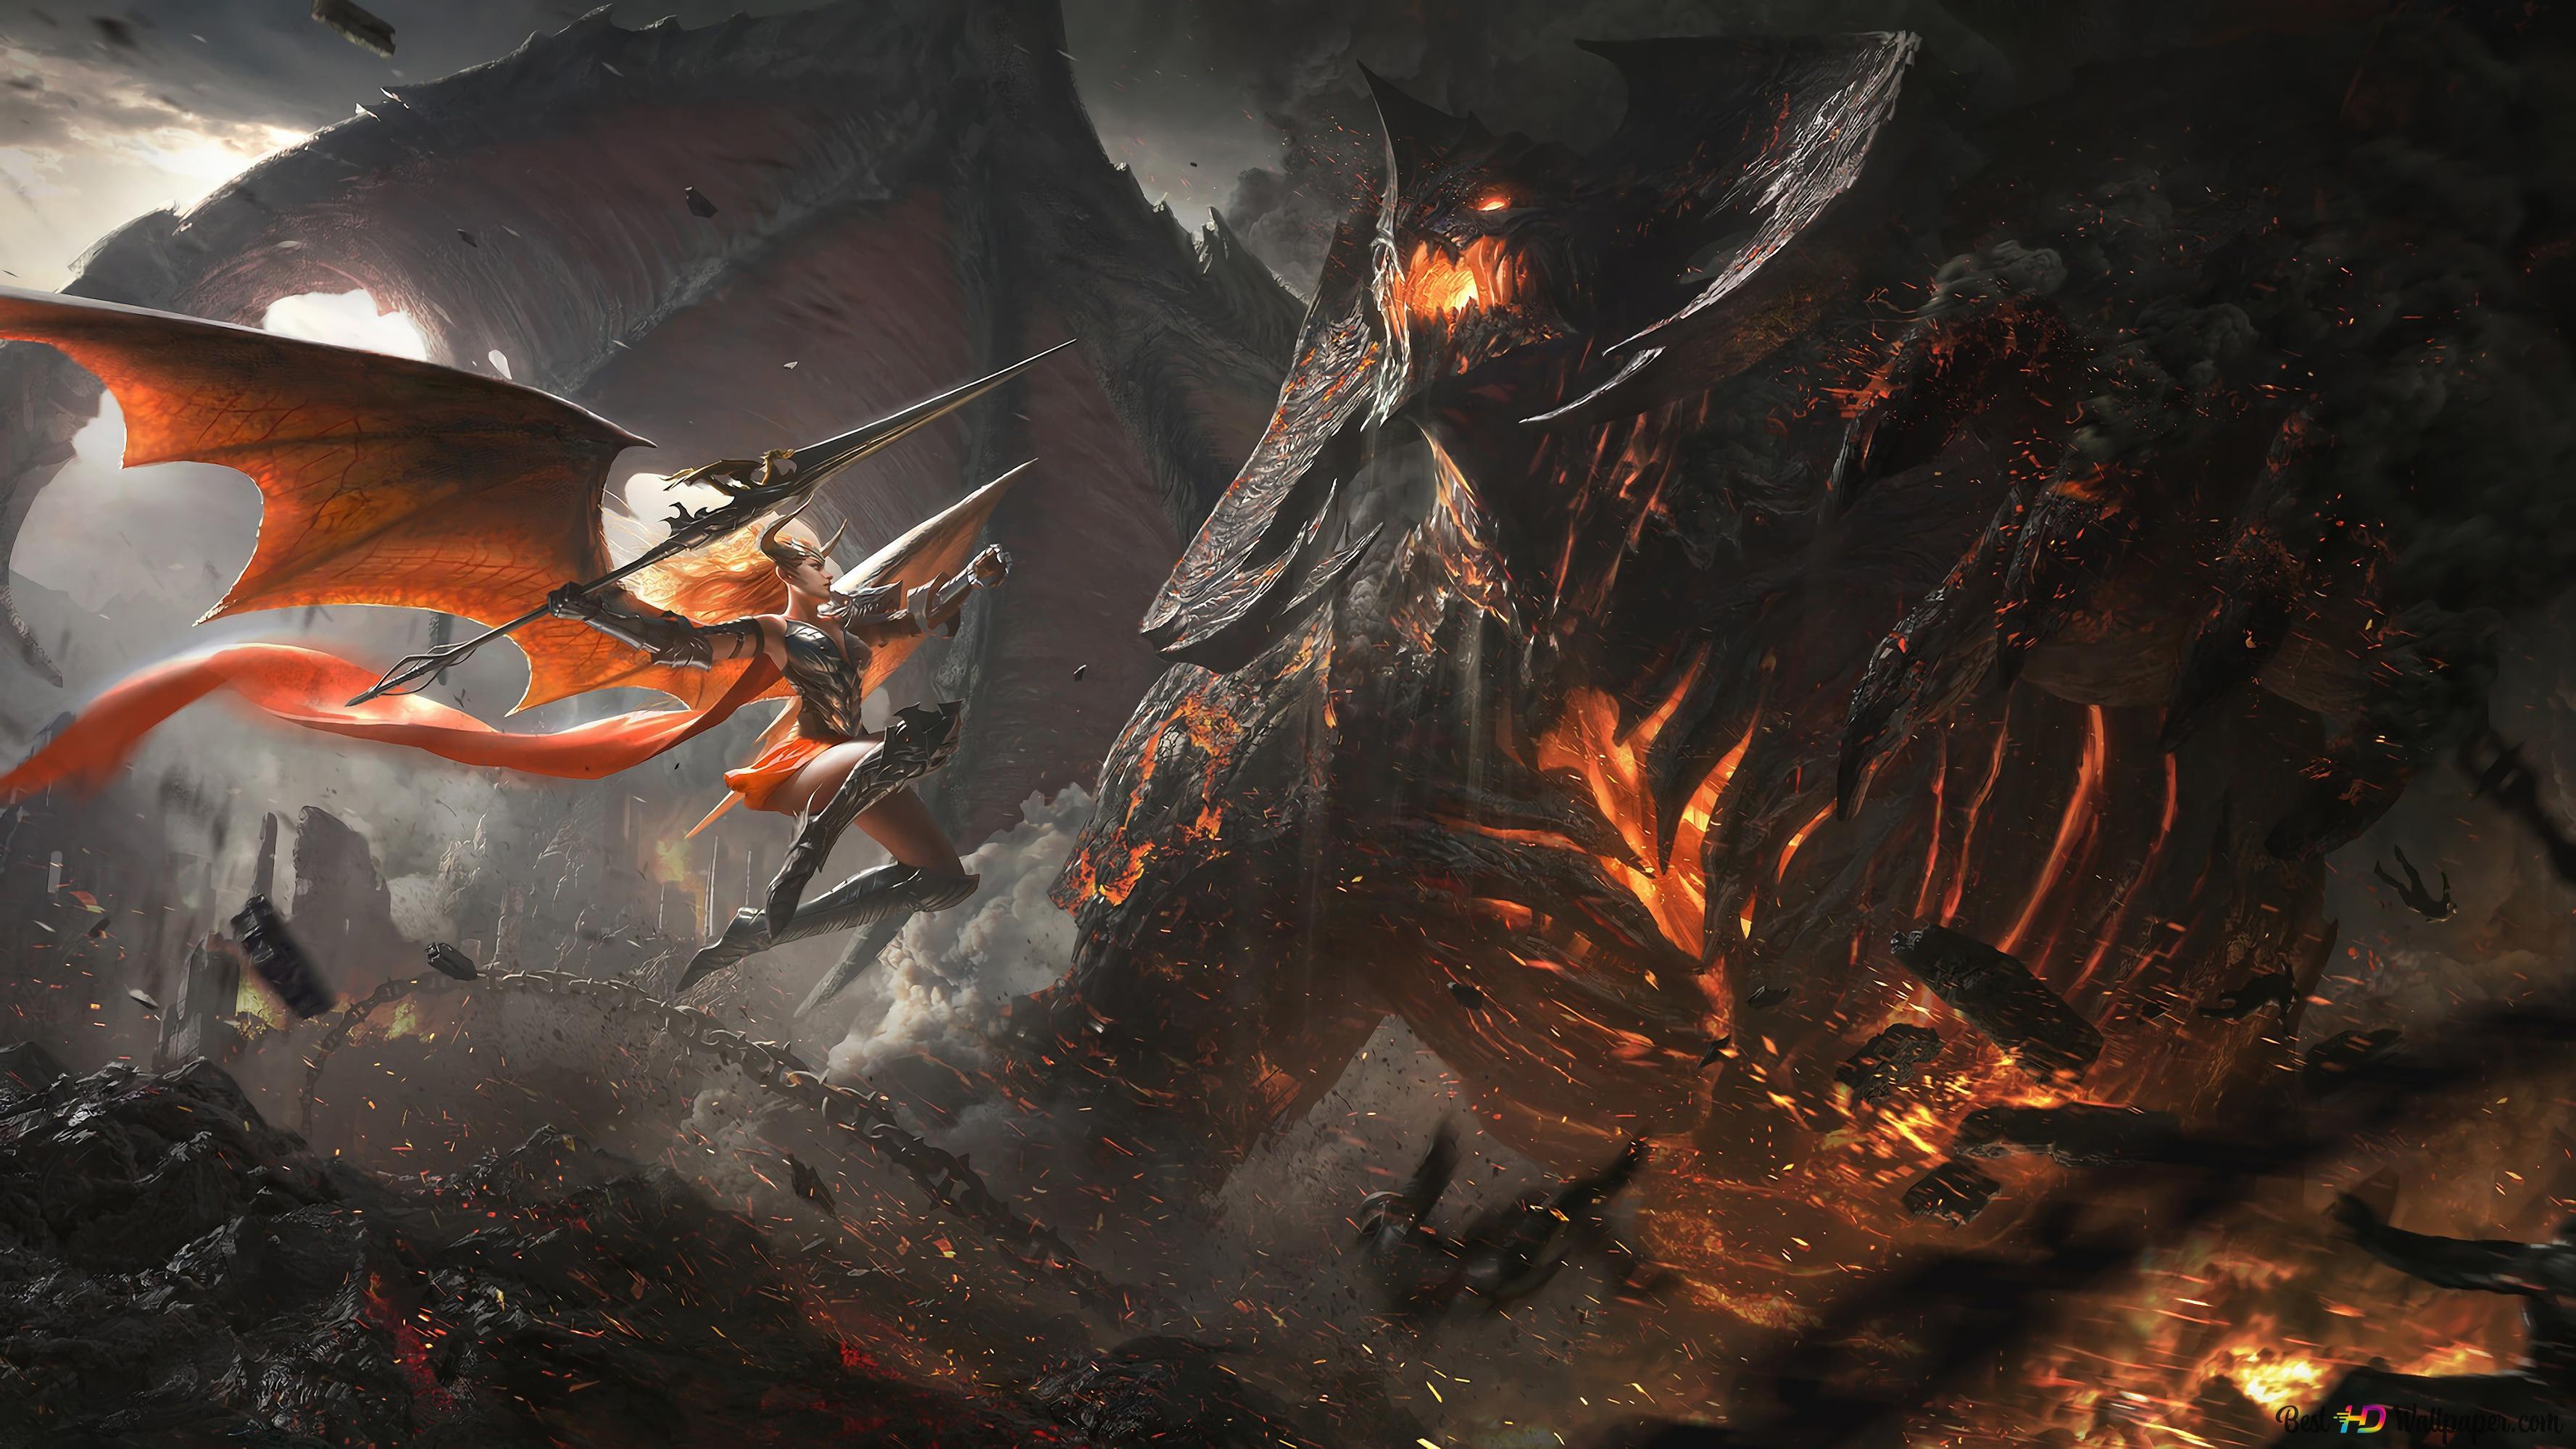 Demon Epic Battle Hd Wallpaper Download